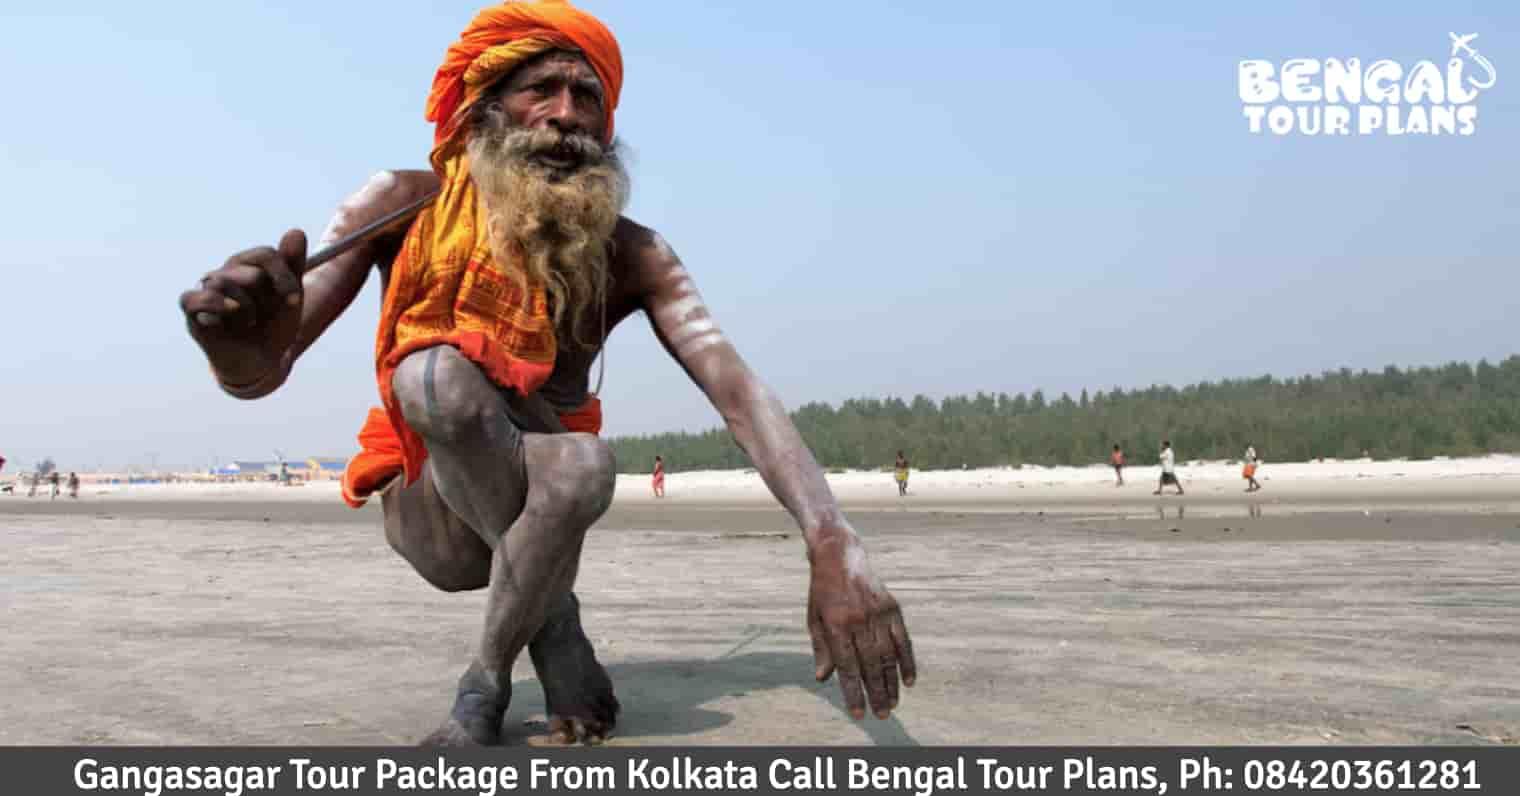 Gangasagar Tour From Kolkata